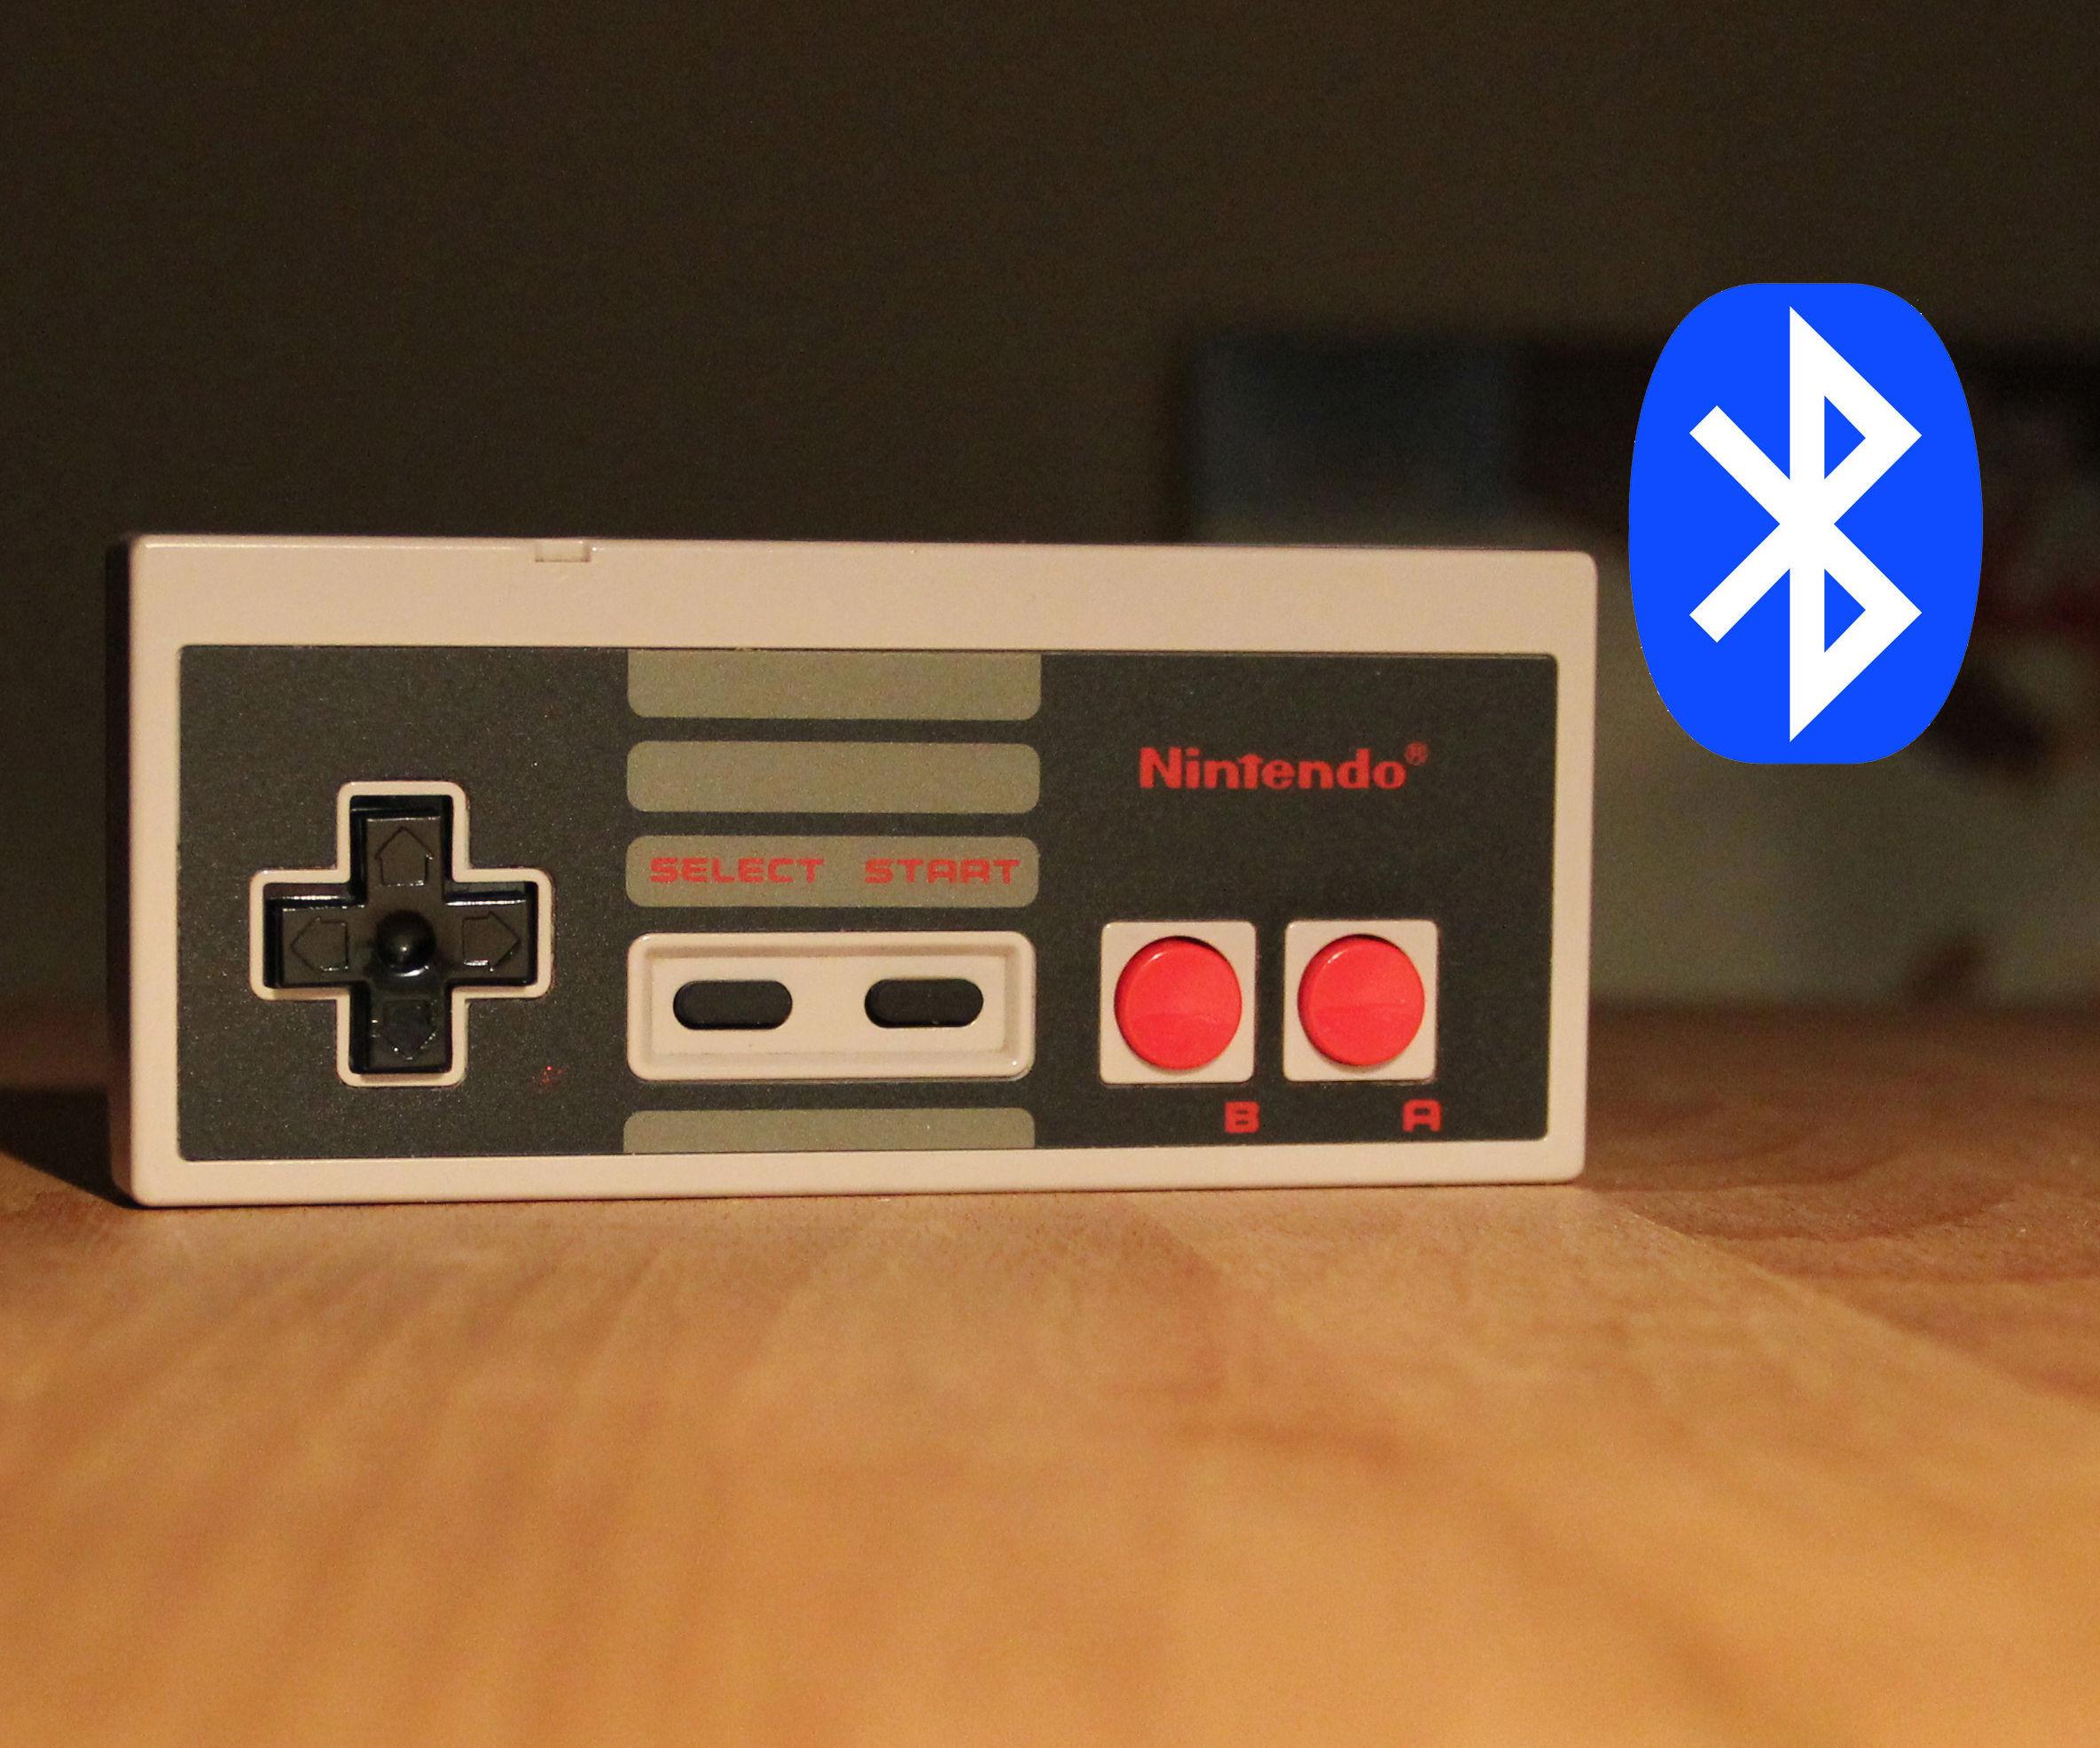 Bluetooth Nintendo NES controller using Wiimote!